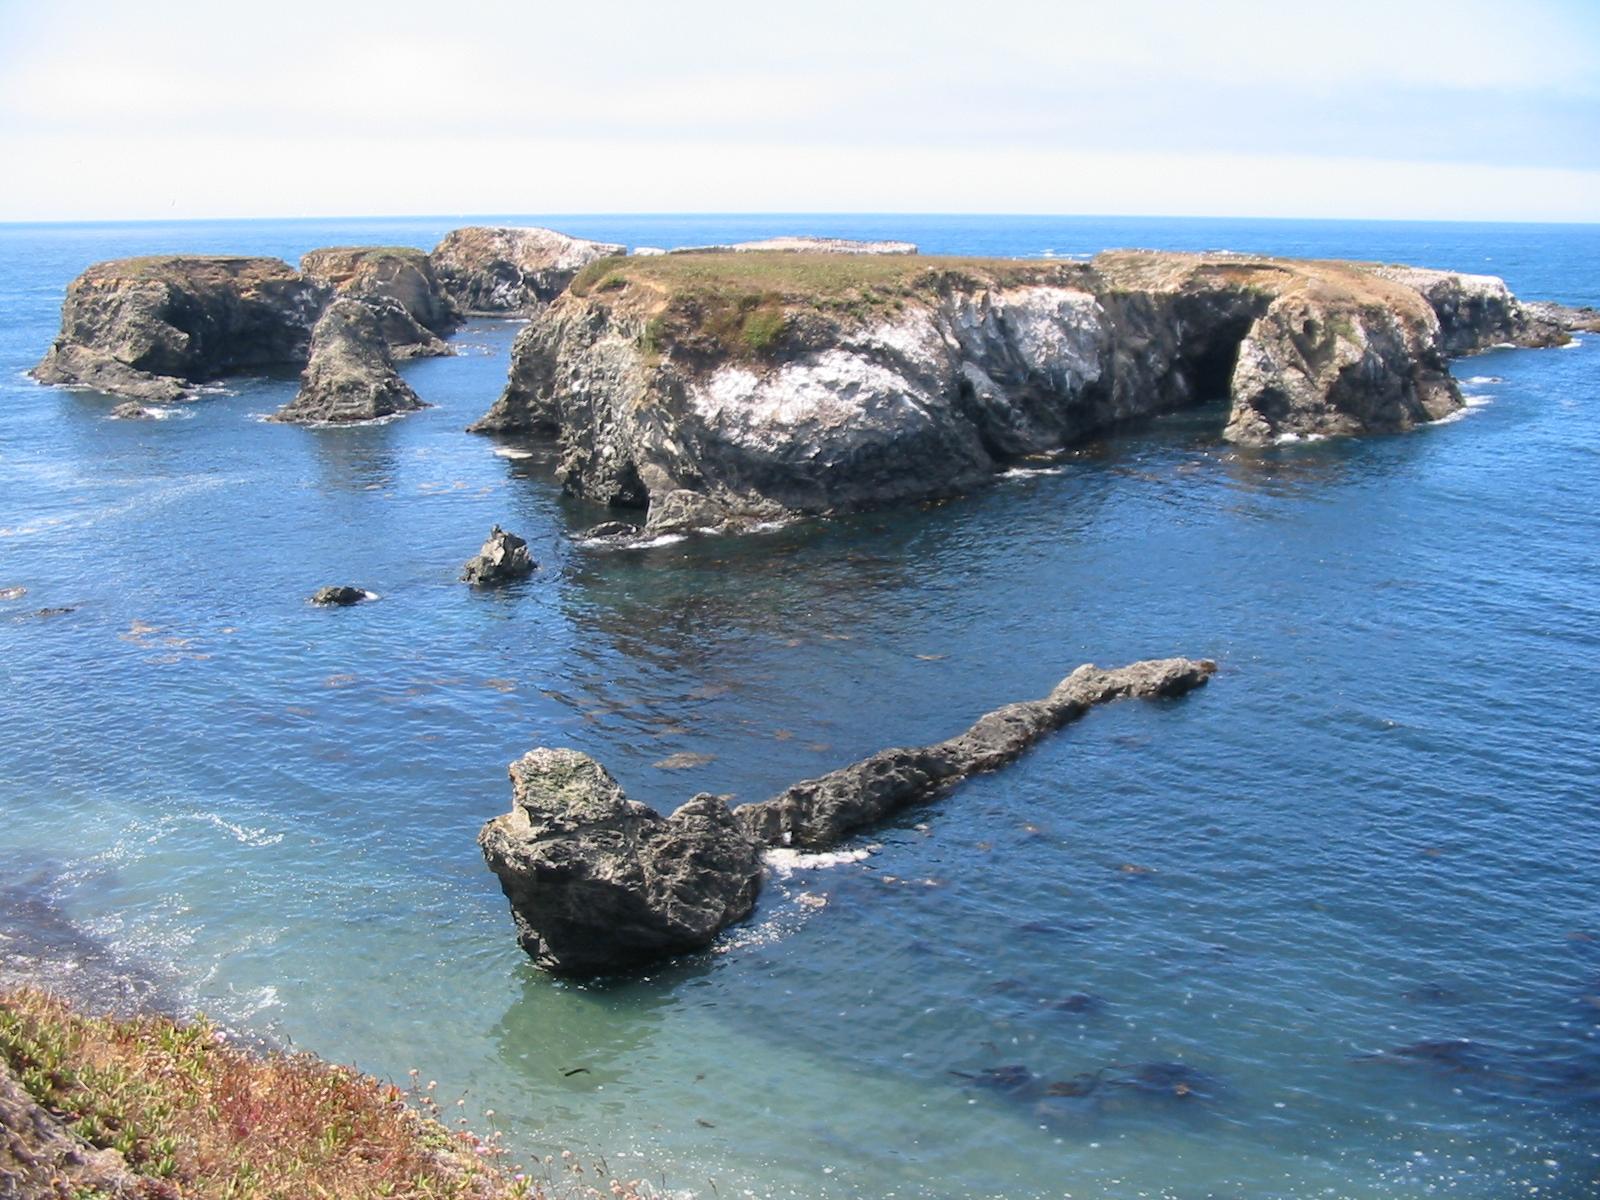 File:Islands off mendocino.jpg - Wikipedia